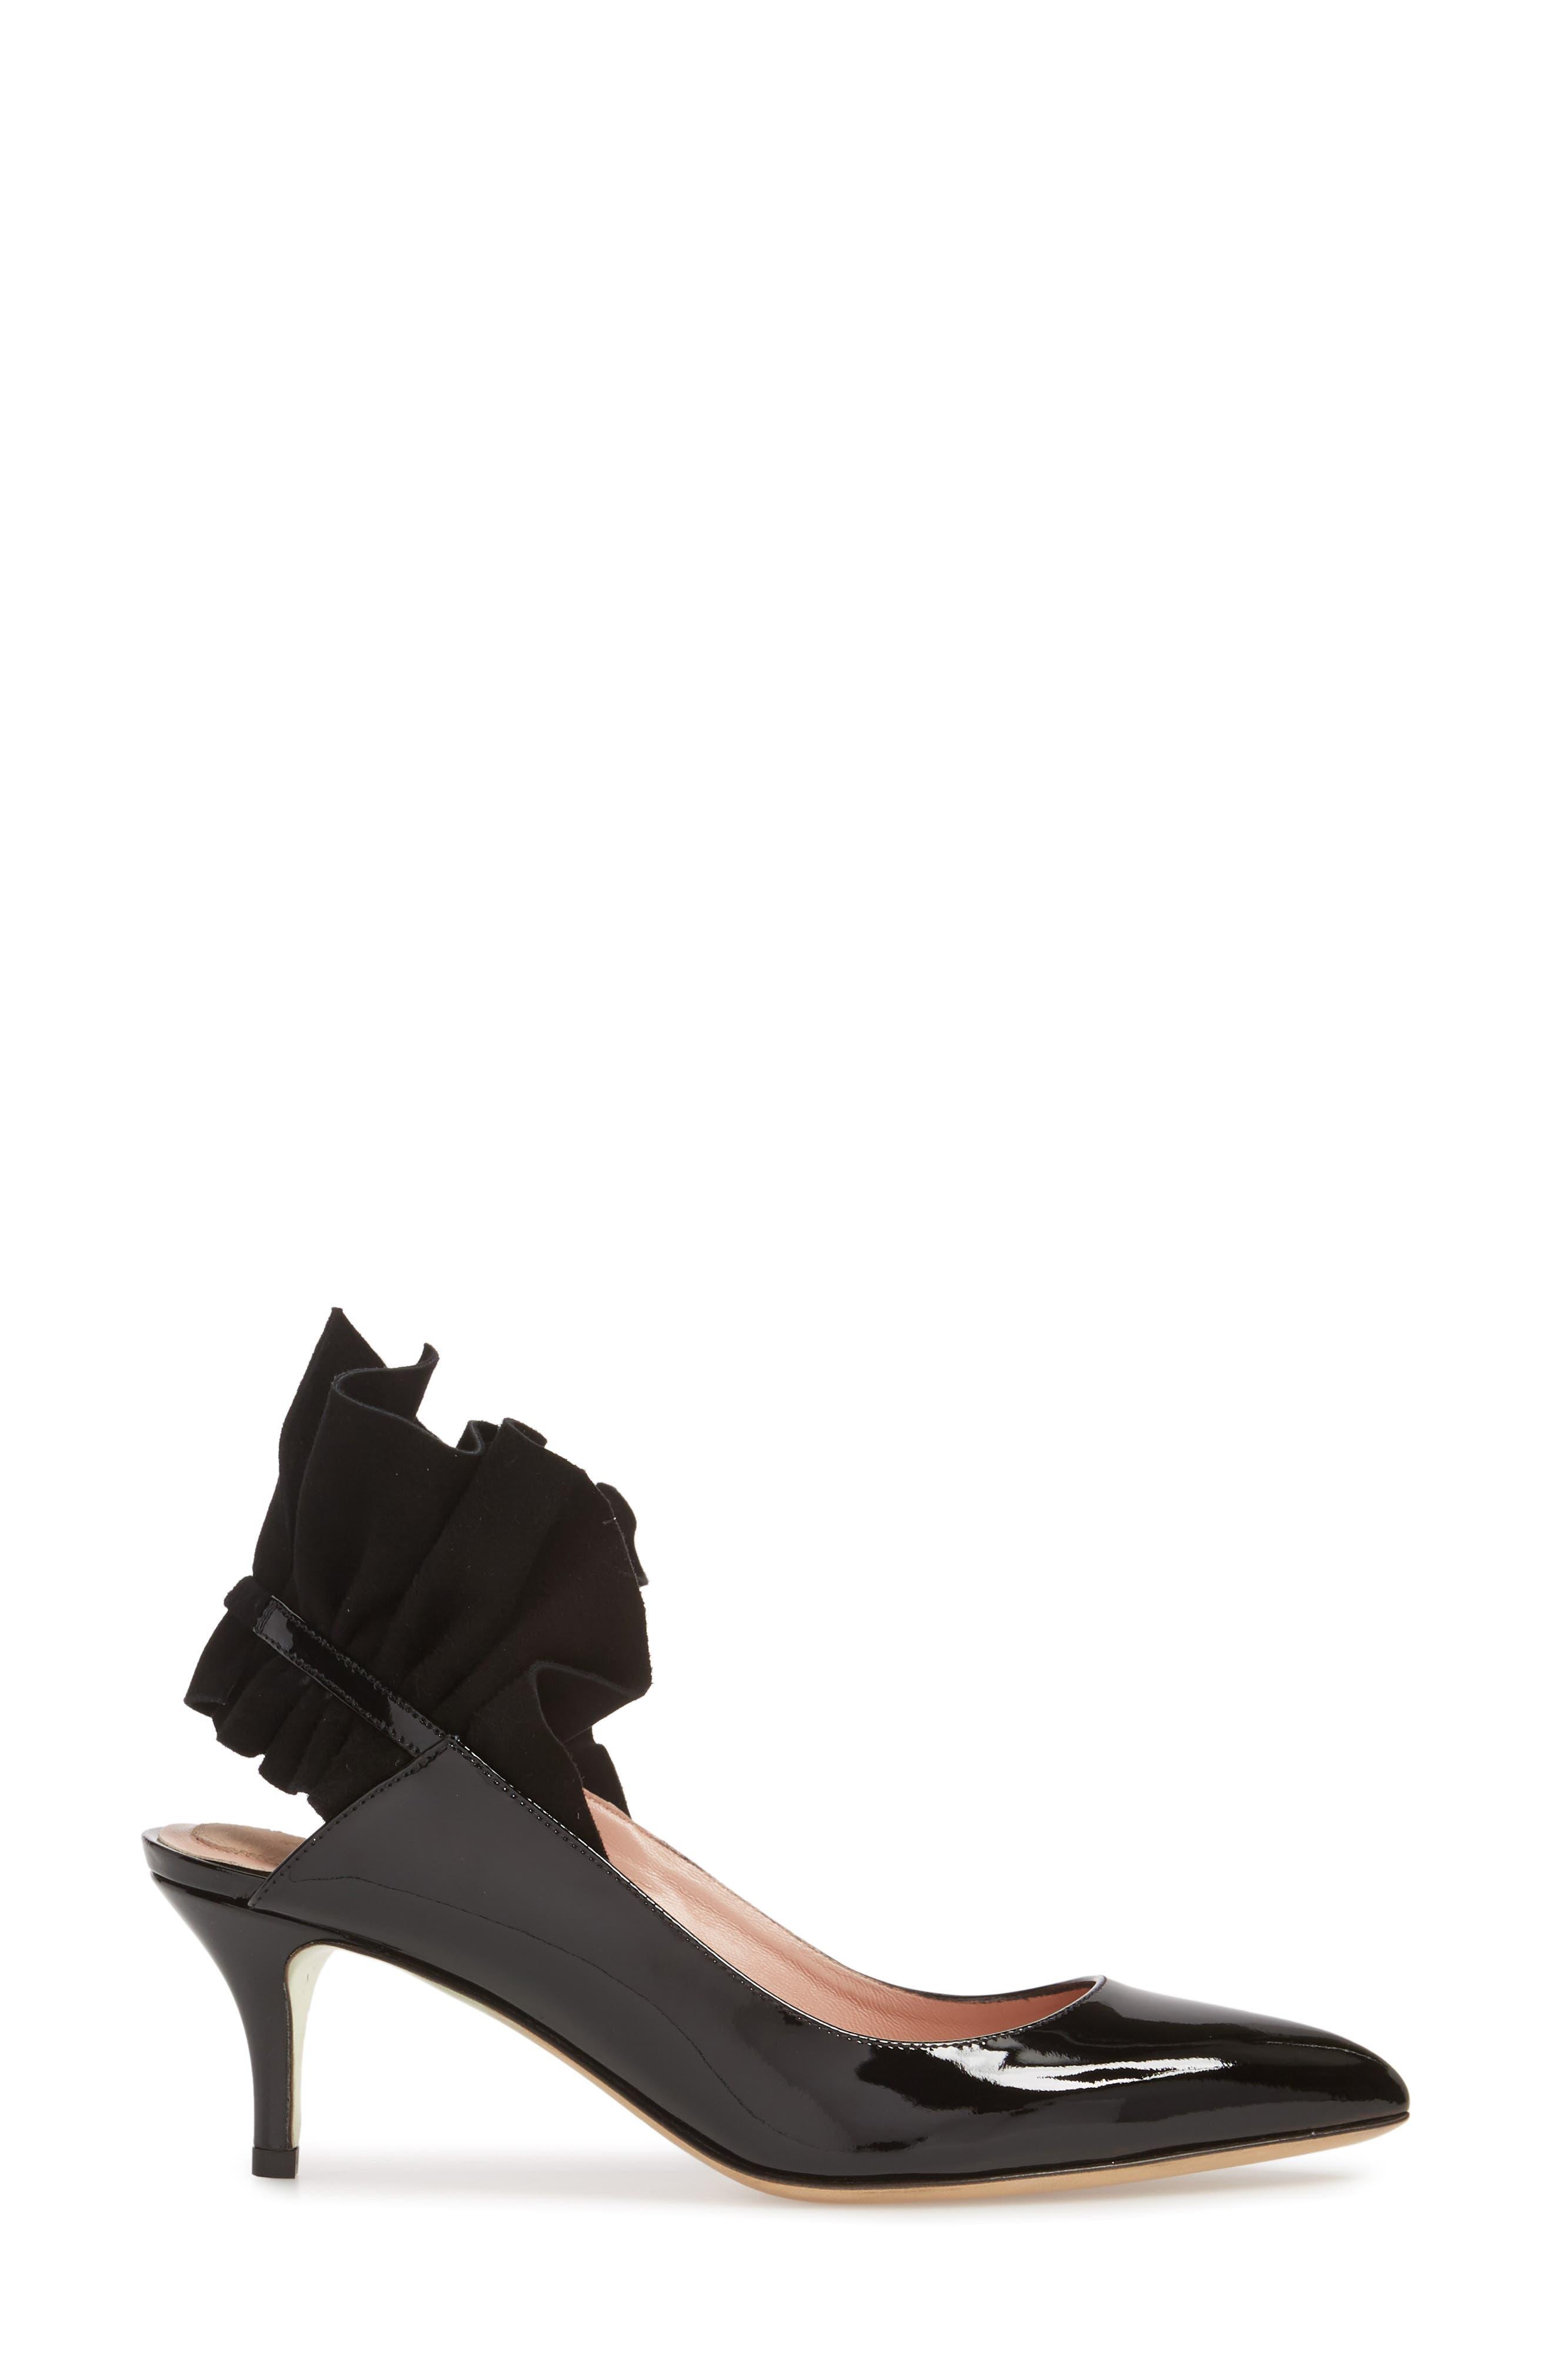 Frills For All Slingback Pump,                             Alternate thumbnail 3, color,                             BLACK